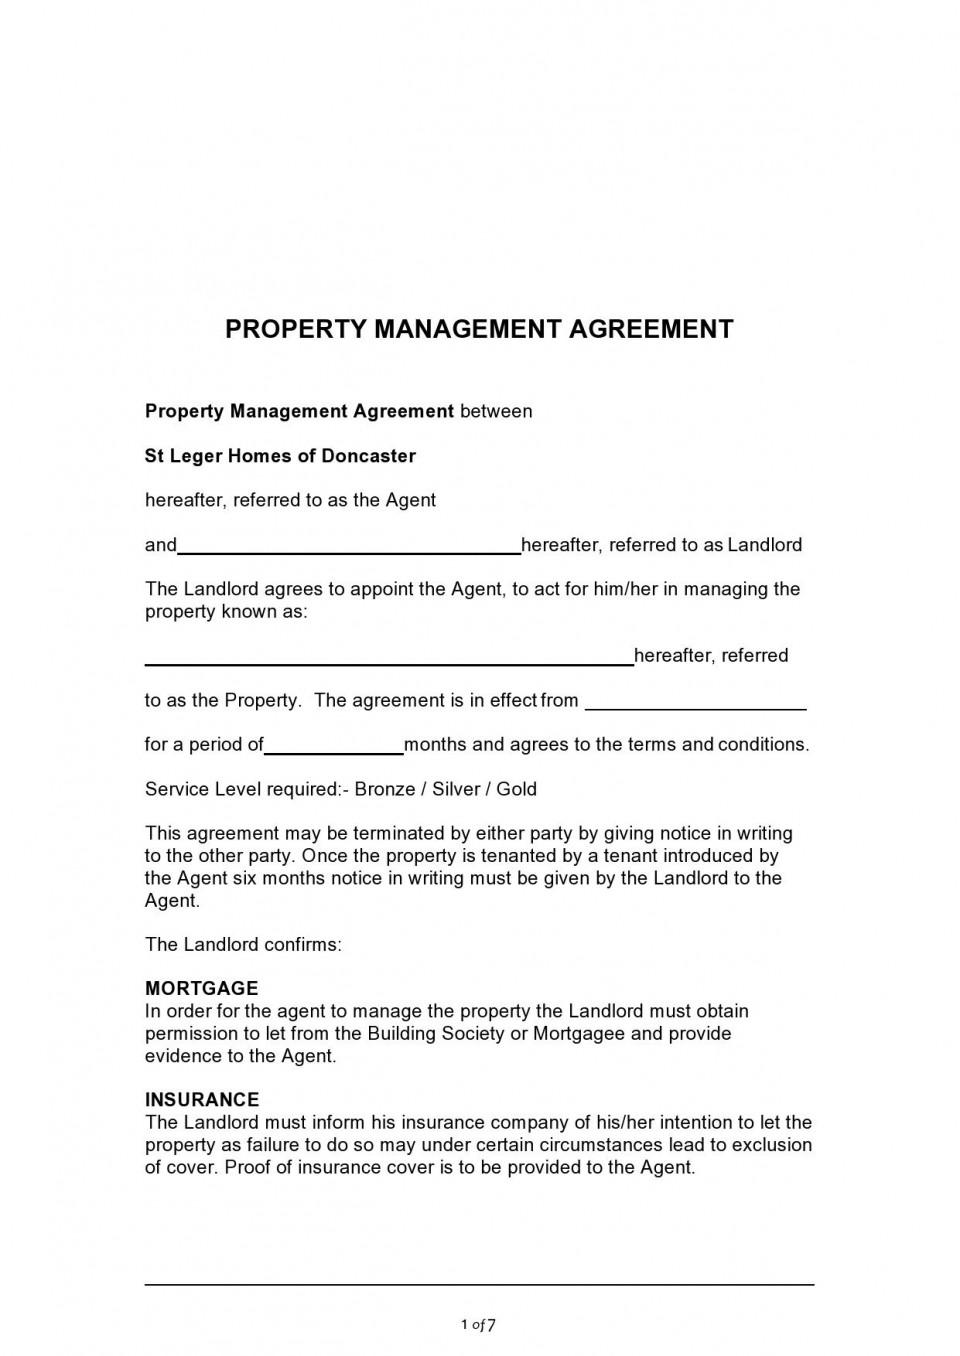 003 Impressive Commercial Property Management Agreement Template Uk Inspiration 960